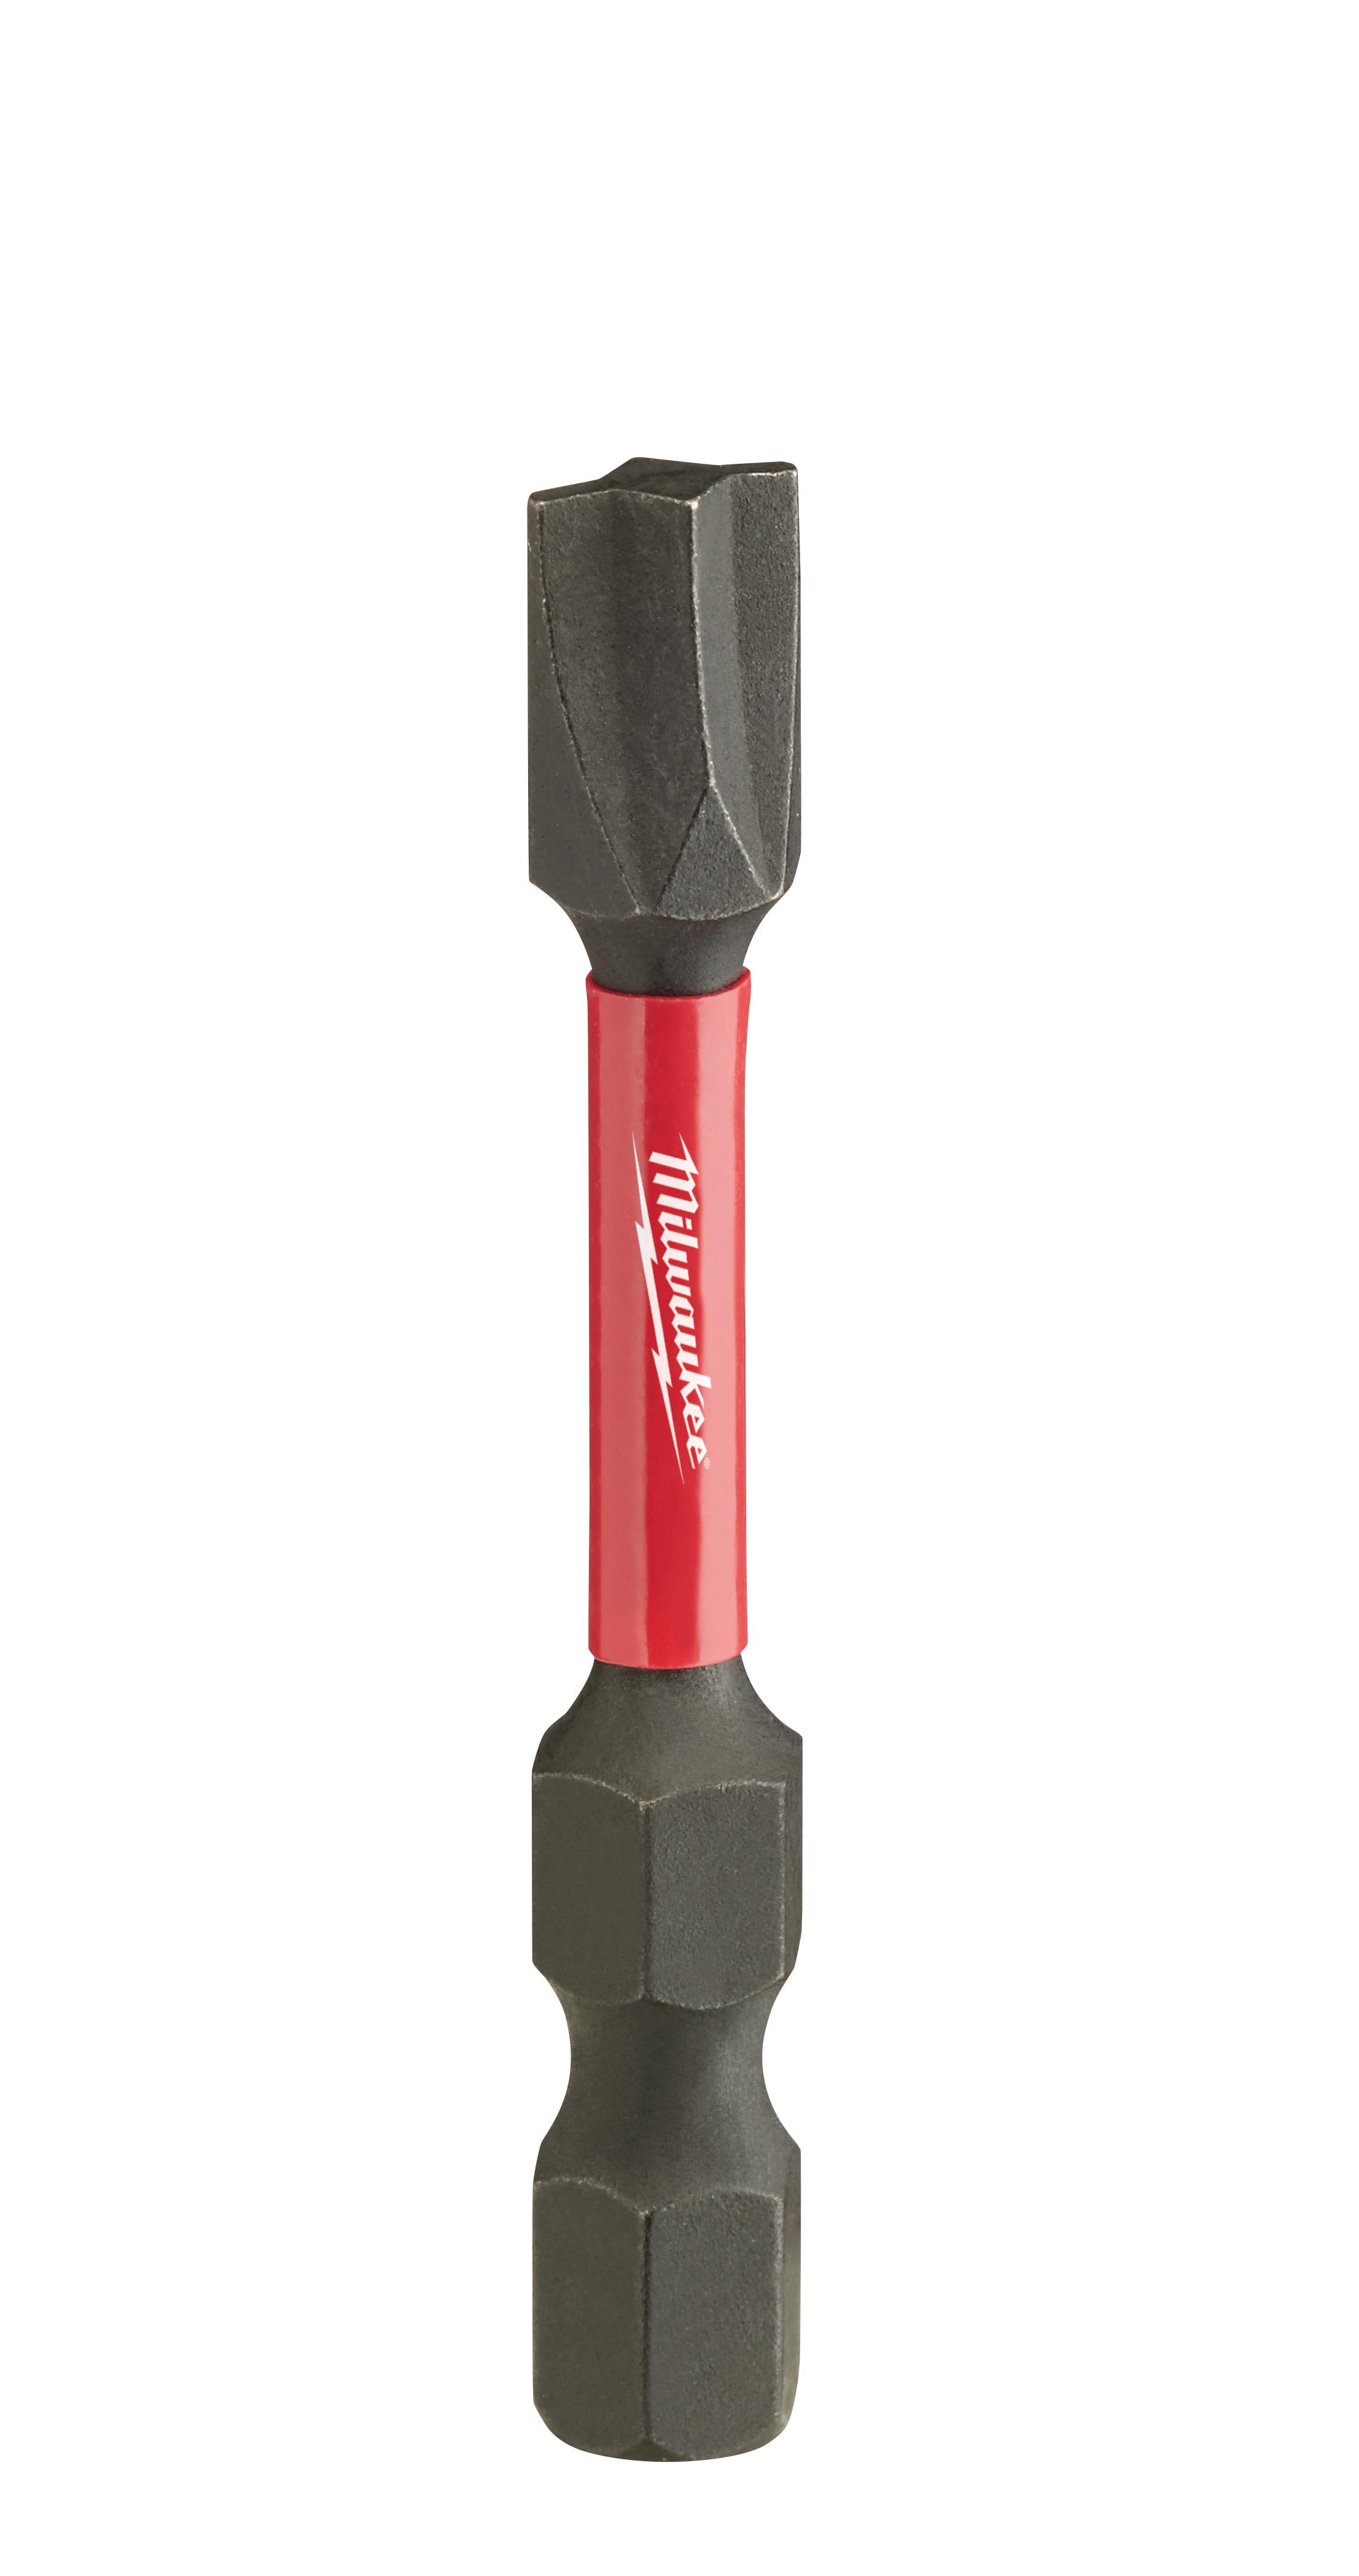 Milwaukee® SHOCKWAVE™ 48-32-4746 Impact Insert Bit, P2R Phillips® Point, 1 in OAL, Steel